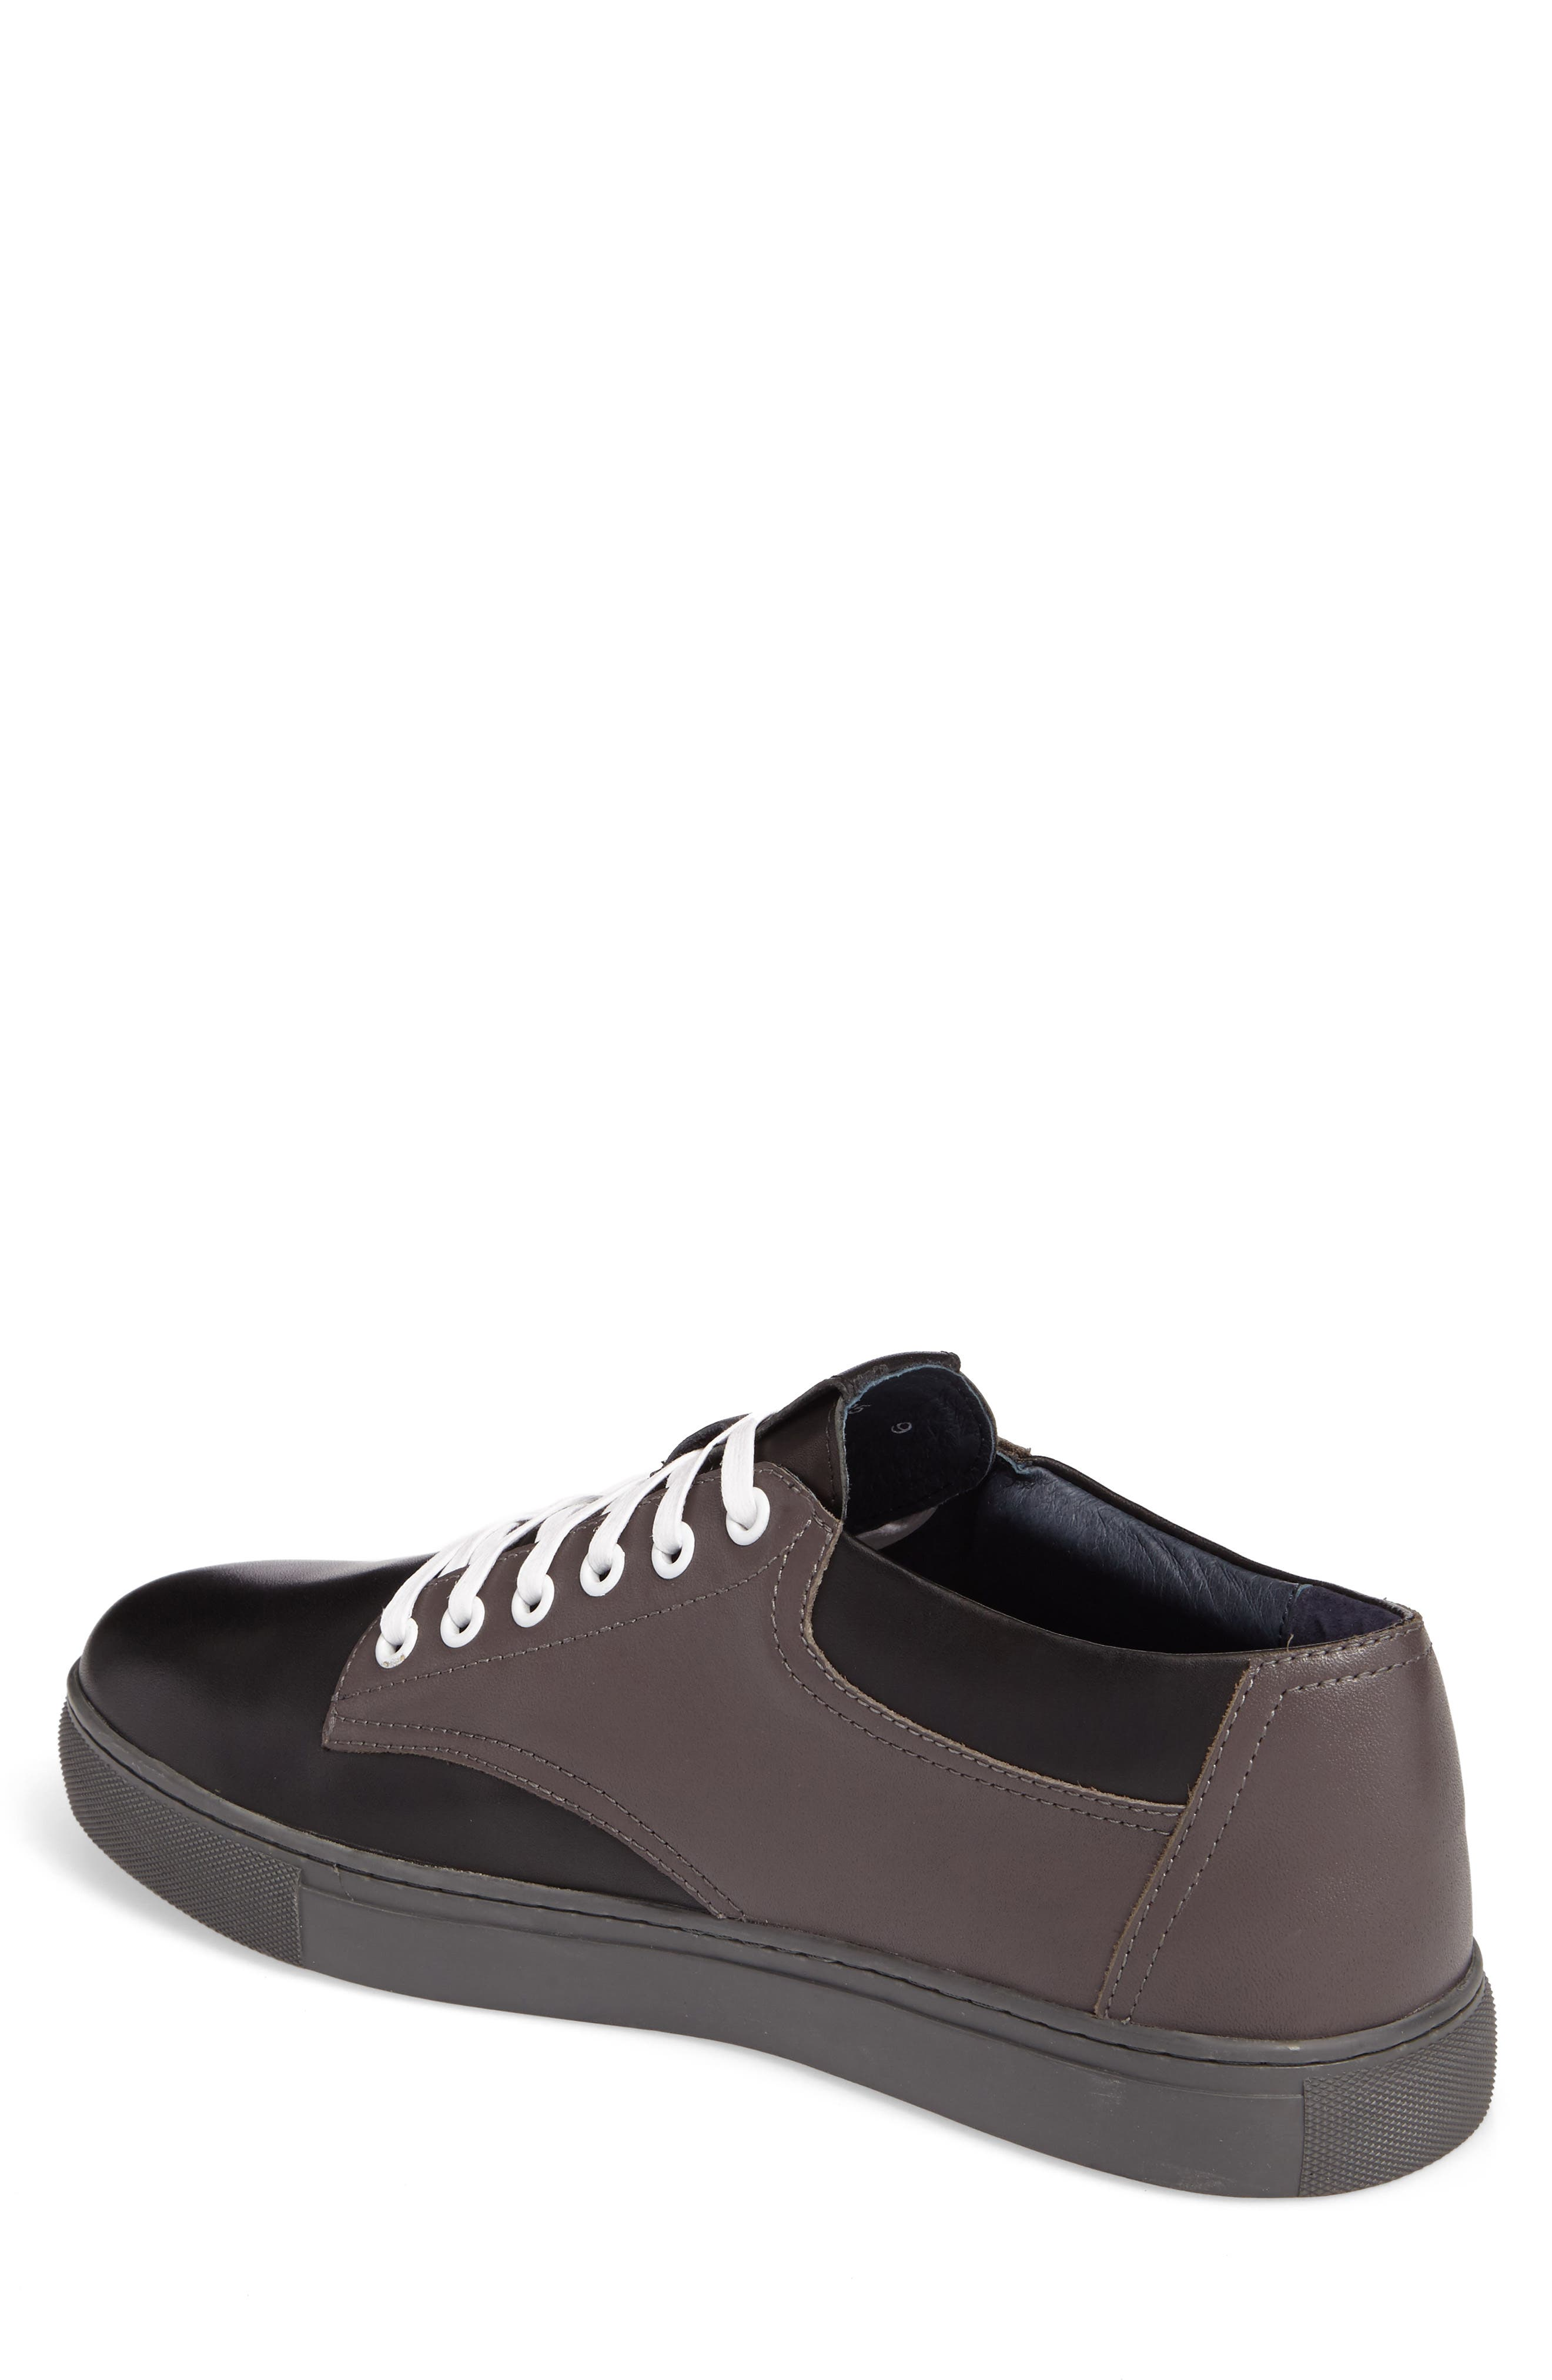 Ralston Sneaker,                             Alternate thumbnail 2, color,                             021